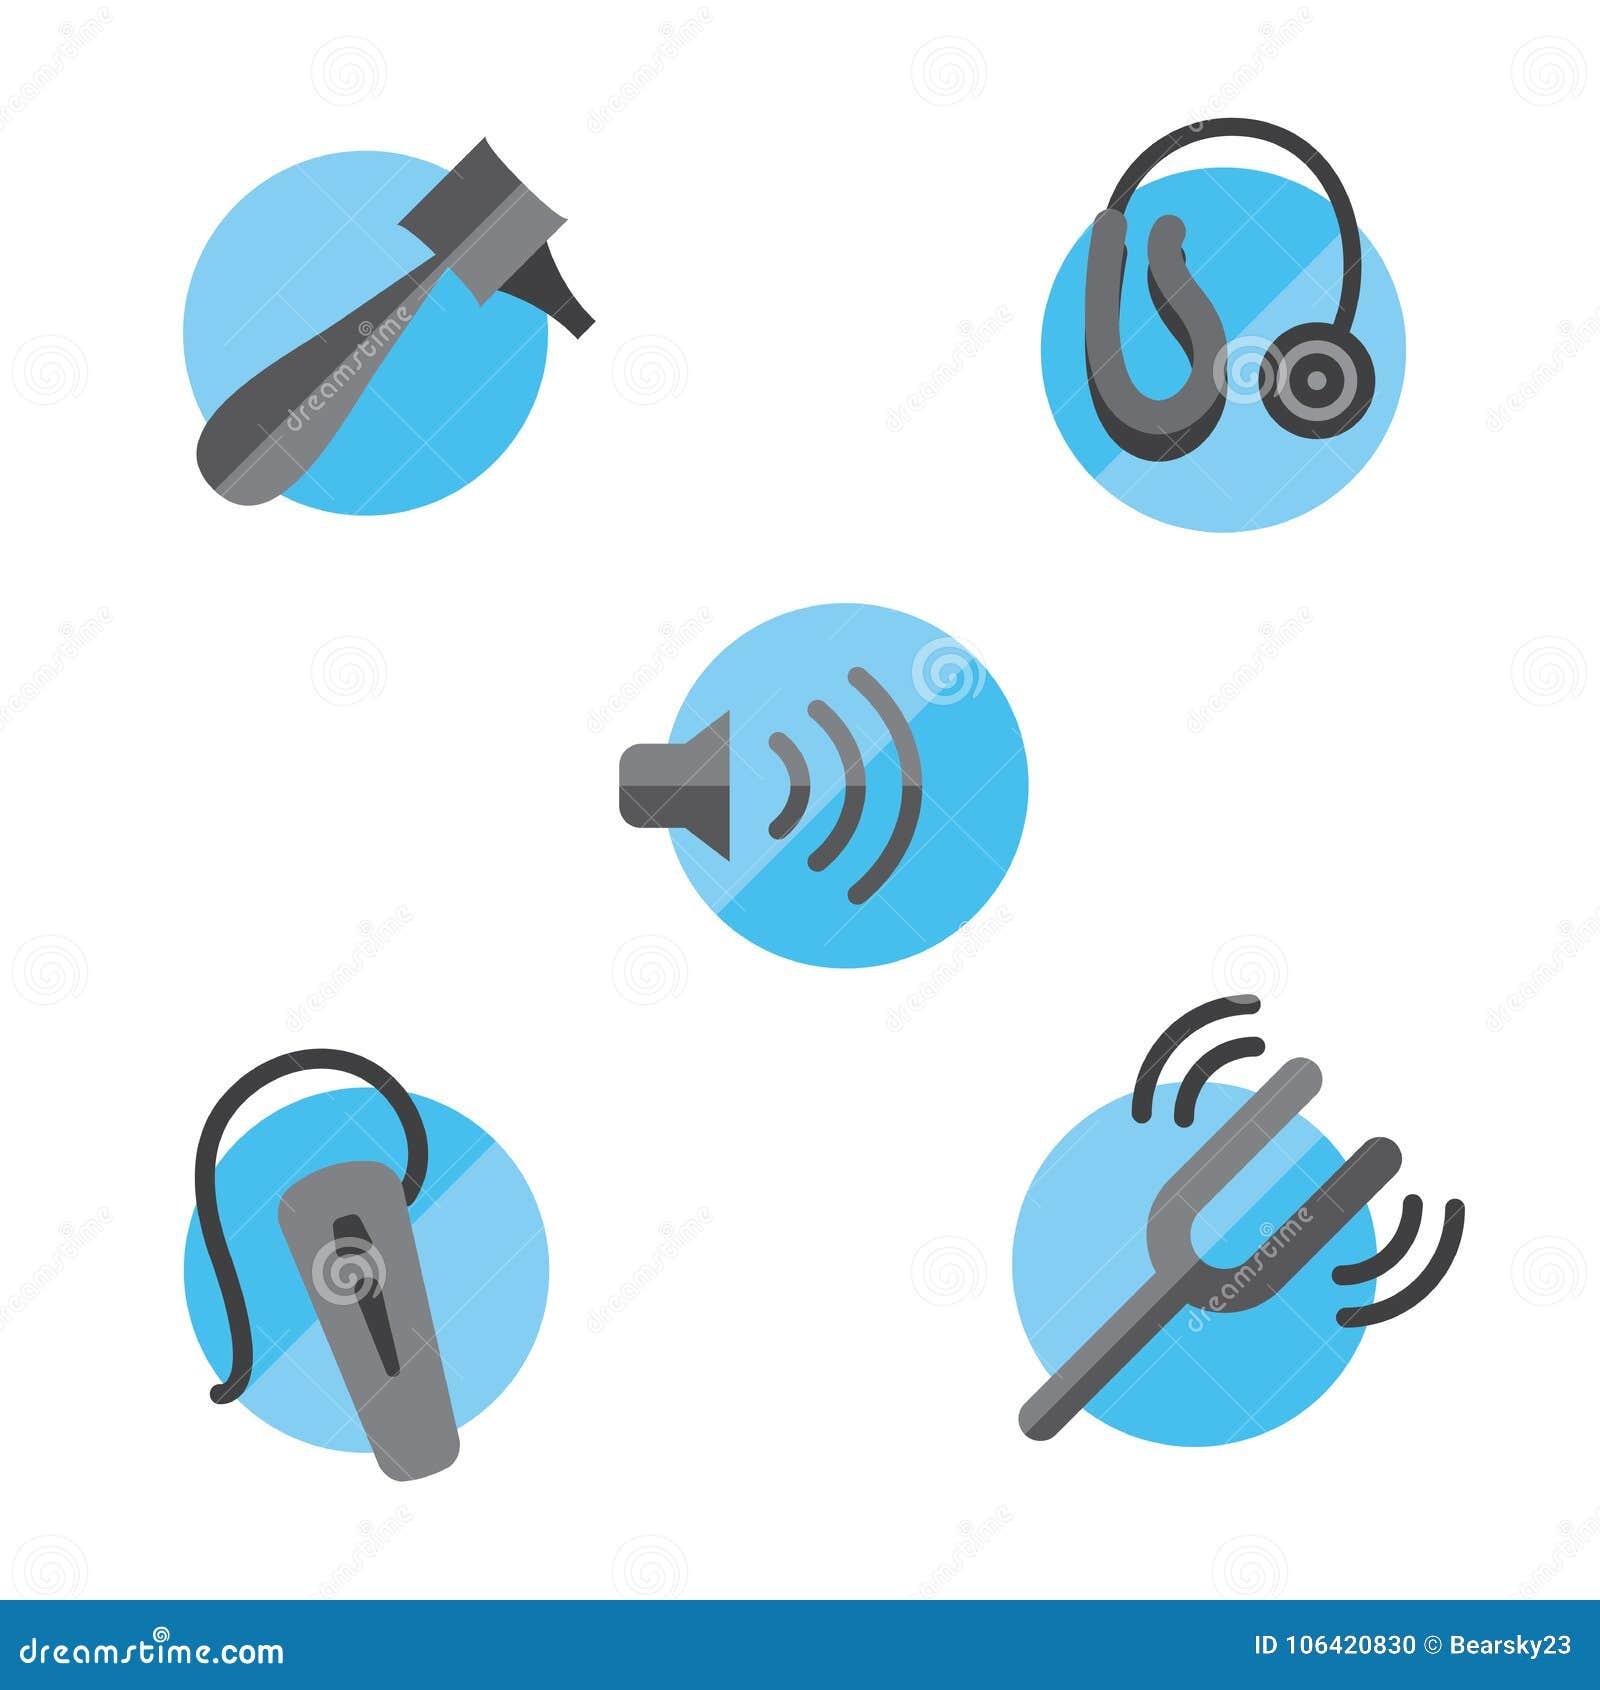 Verlies van het gehoor stevig die pictogram met Oorspiegel, stemvork en heari wordt geplaatst